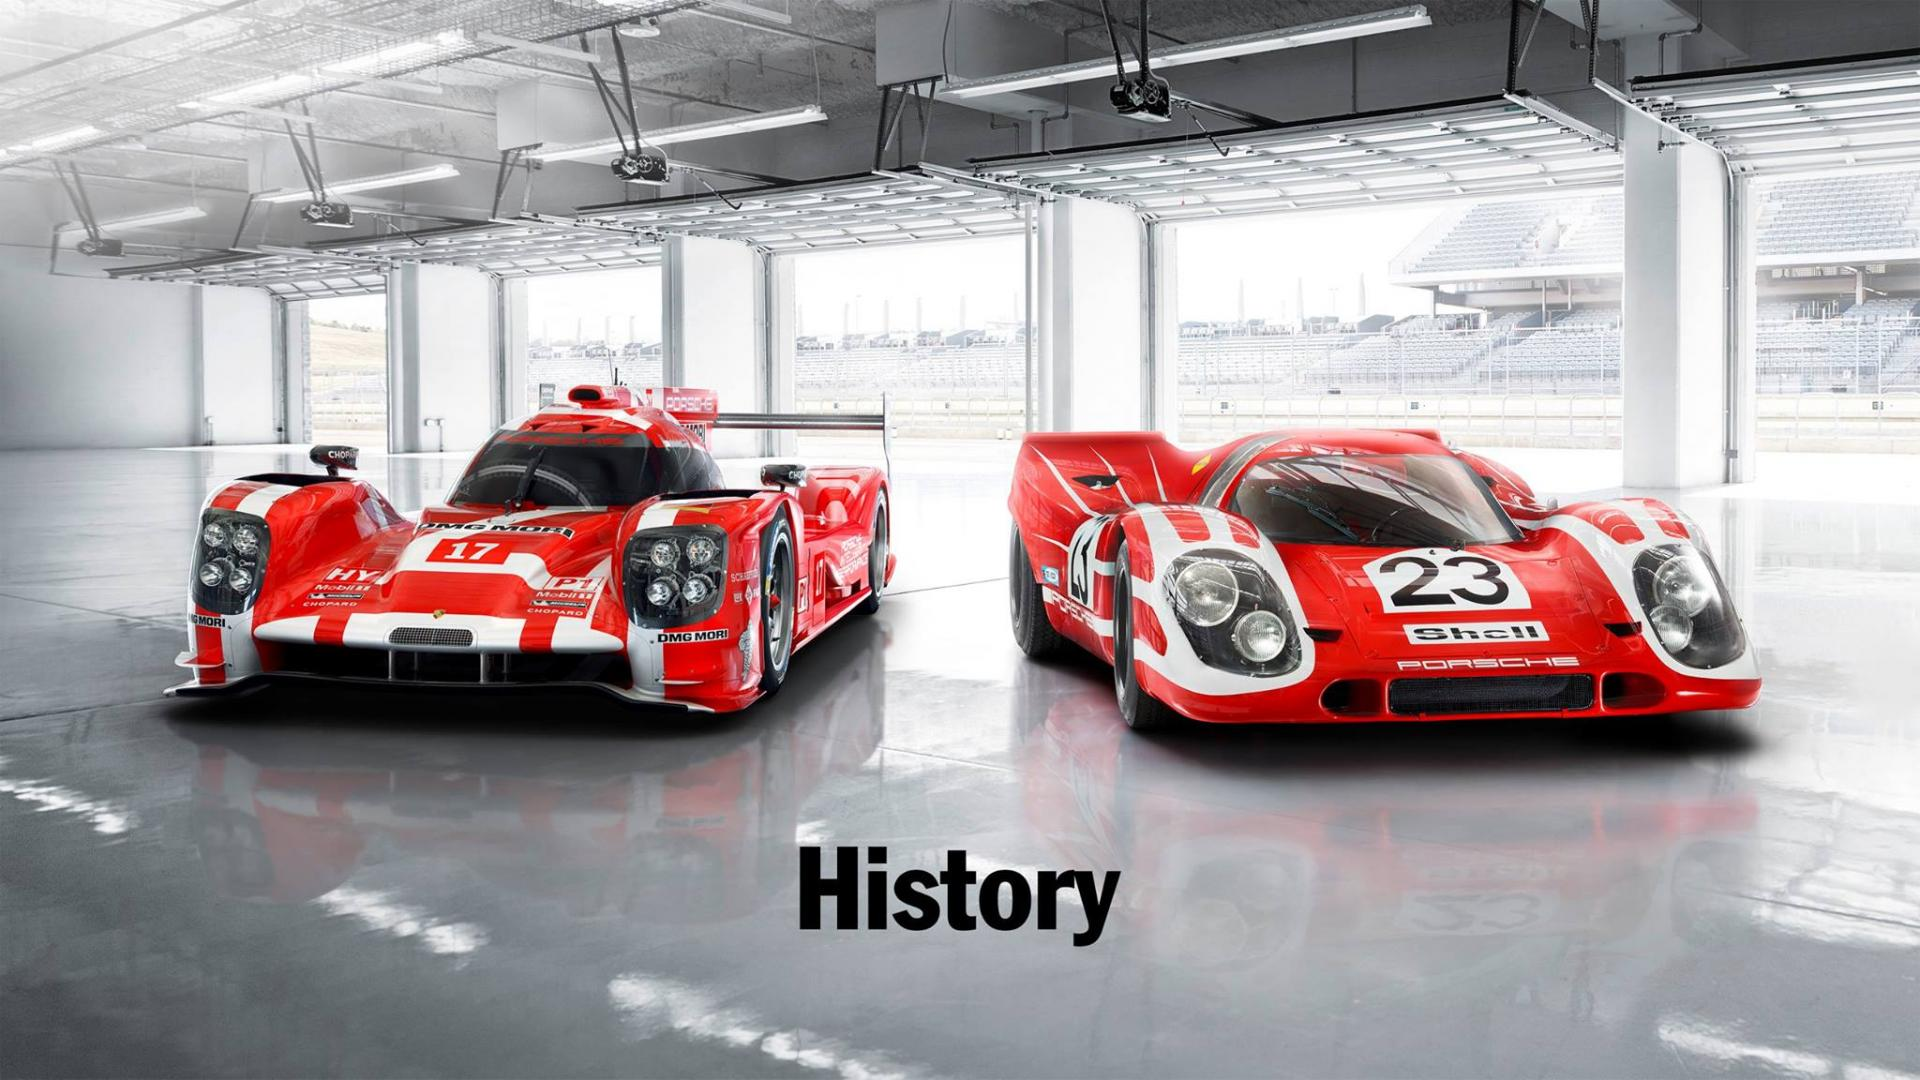 Porsche 919 hybrid - Porsche 917 - History